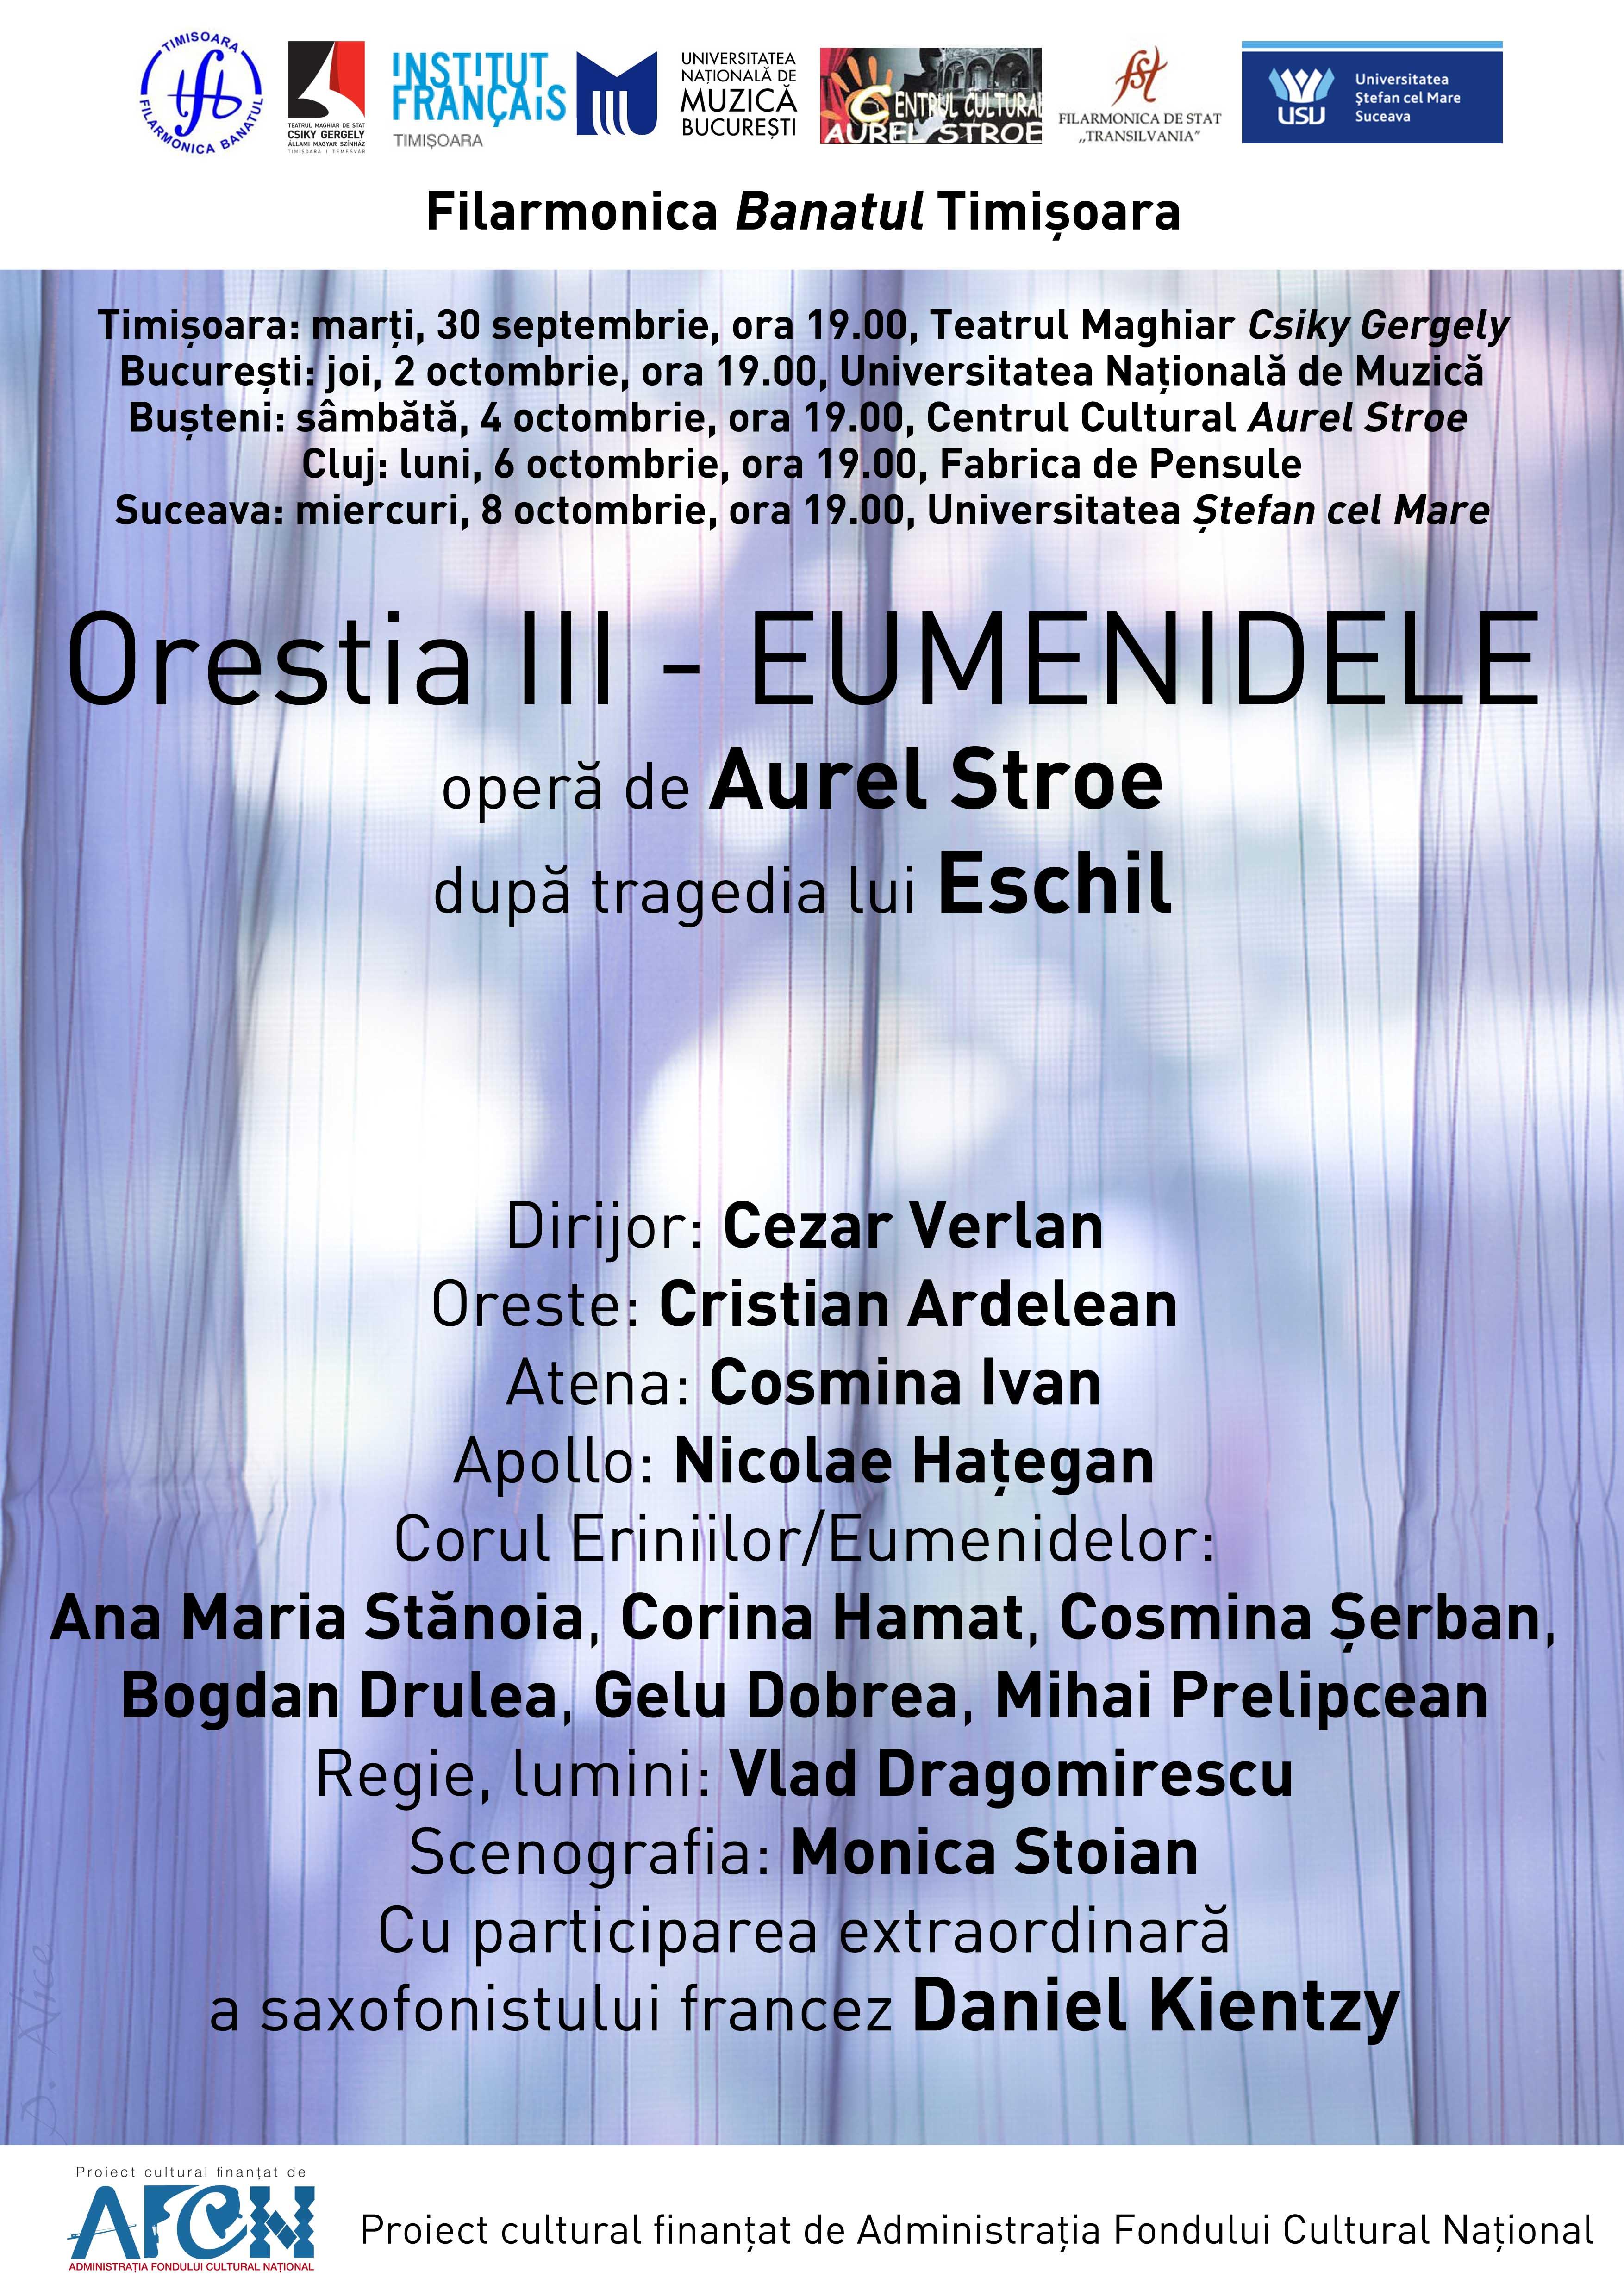 eumenidele 2014